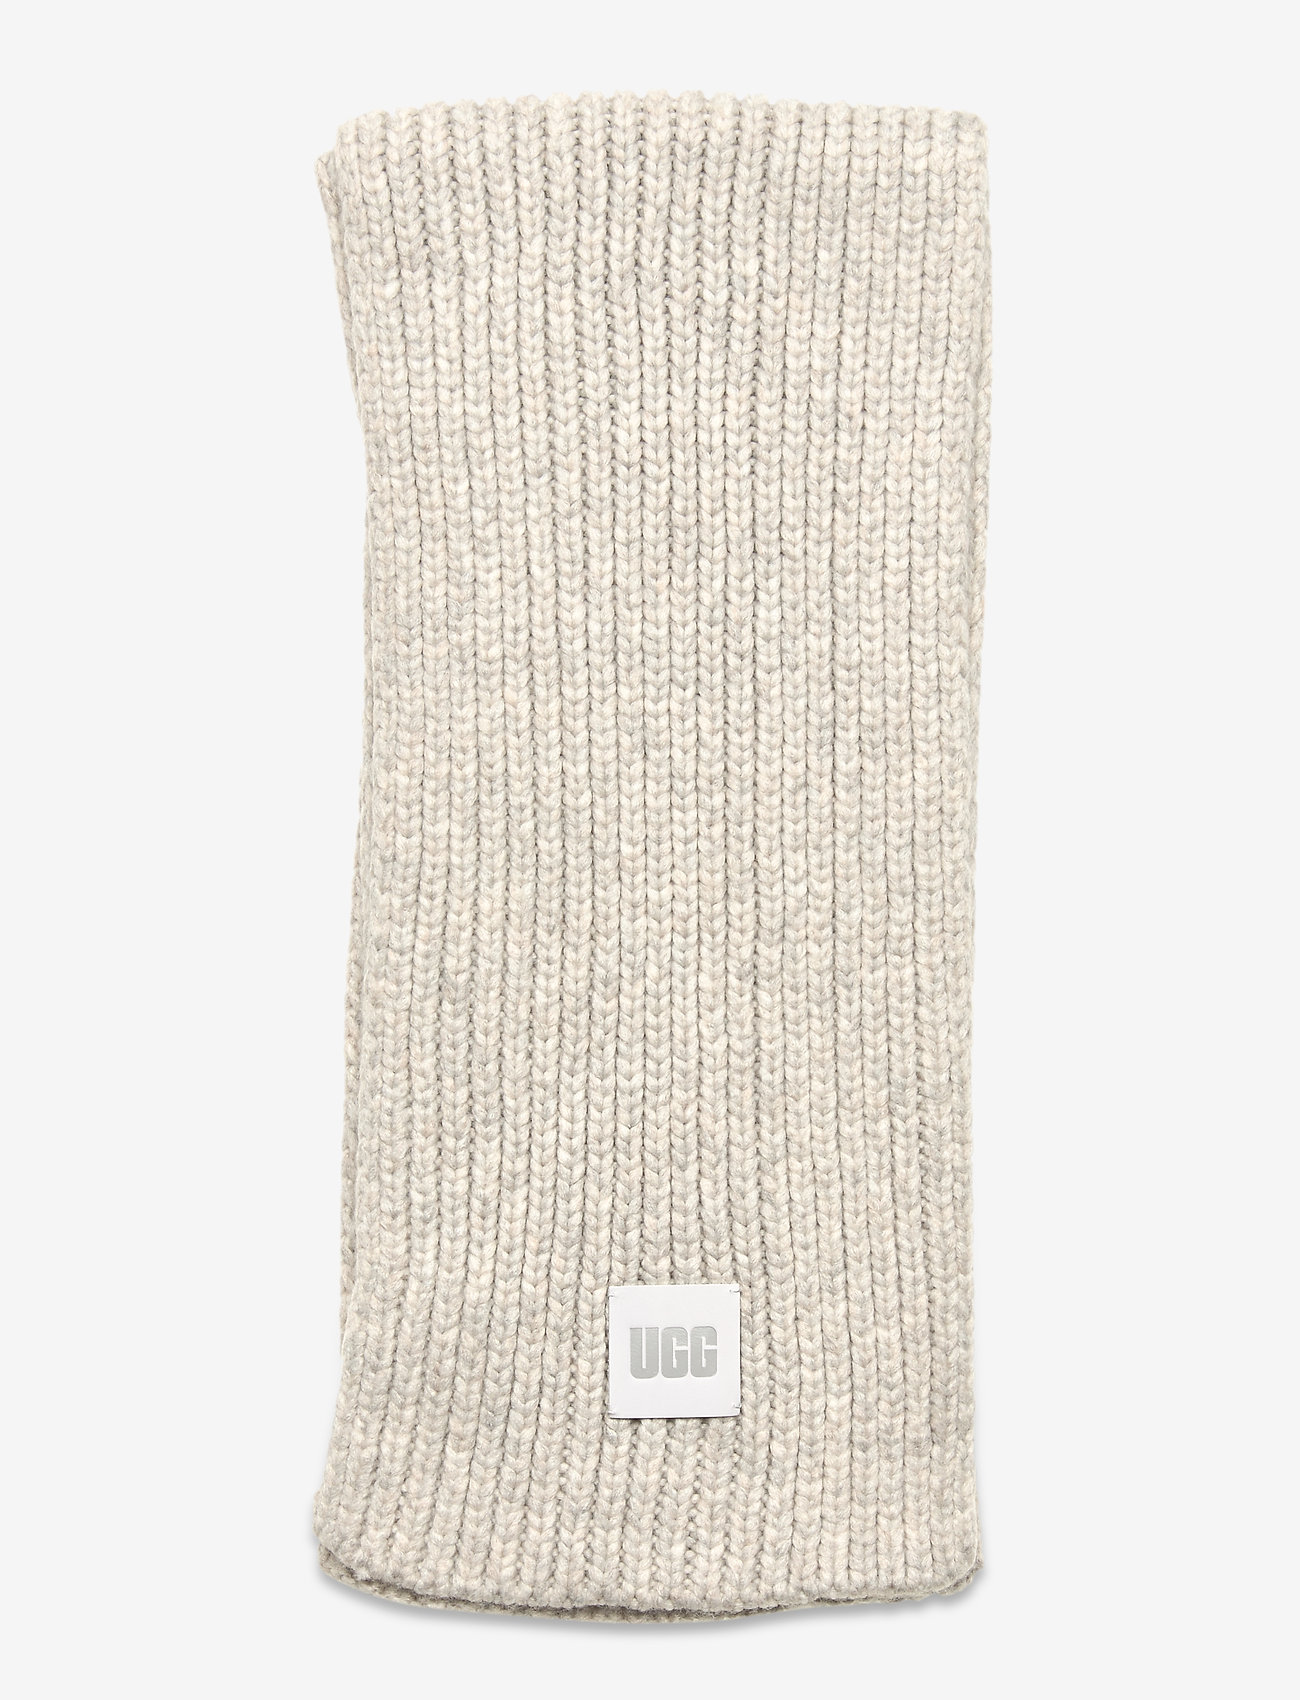 UGG - W CHUNKY RK SCARF - sjaals - light grey - 1